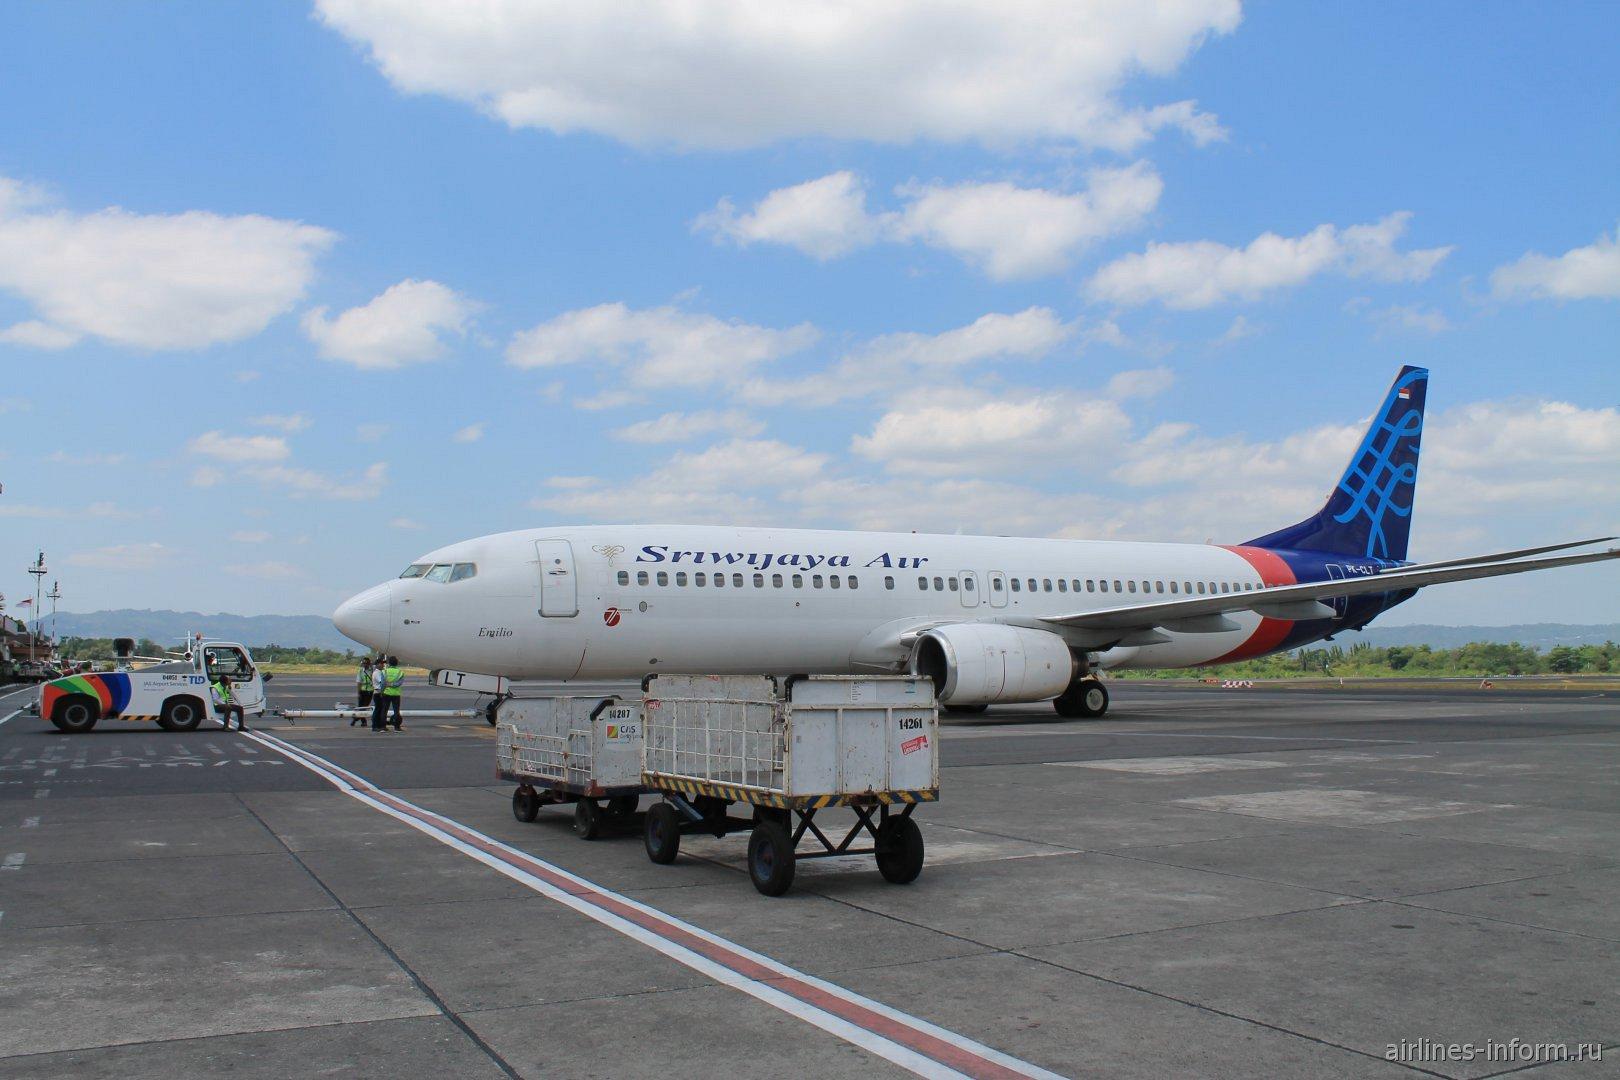 Боинг-737-800 авиакомпании Sriwijaya Airlines в аэропорту Джокьякарта